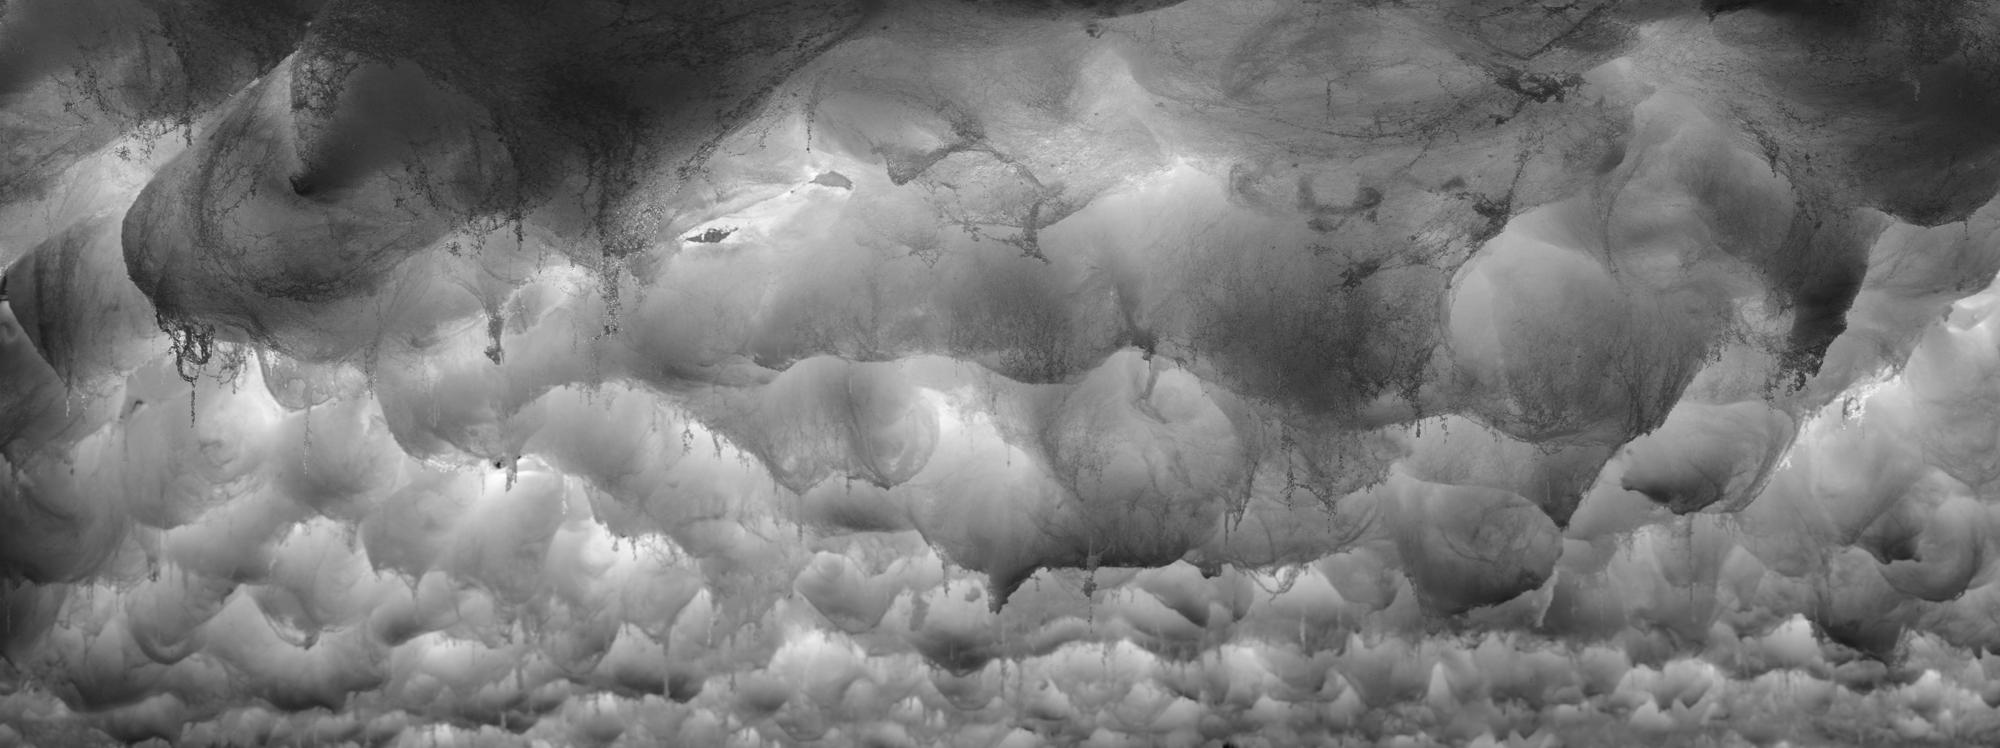 DAVID LAWREY & JAKI MIDDLETON  Downfall #5  2016 c-type metallic print 126 × 48 cm (framed)